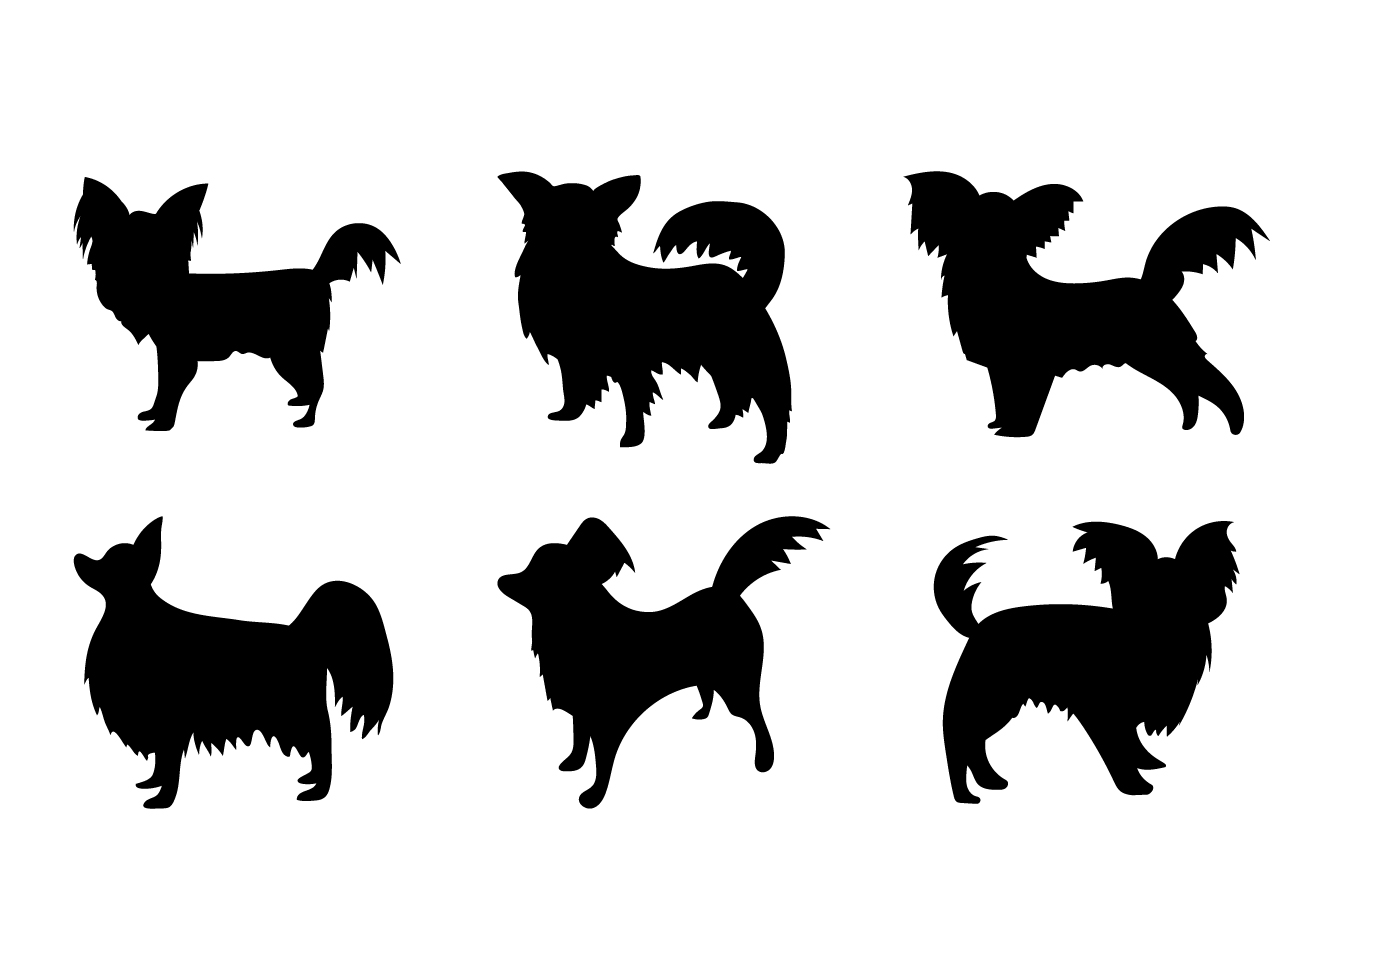 LABRADOODLE DOG ART PRINT POSTER Breed Black Silhouette Vintage Outline Picture